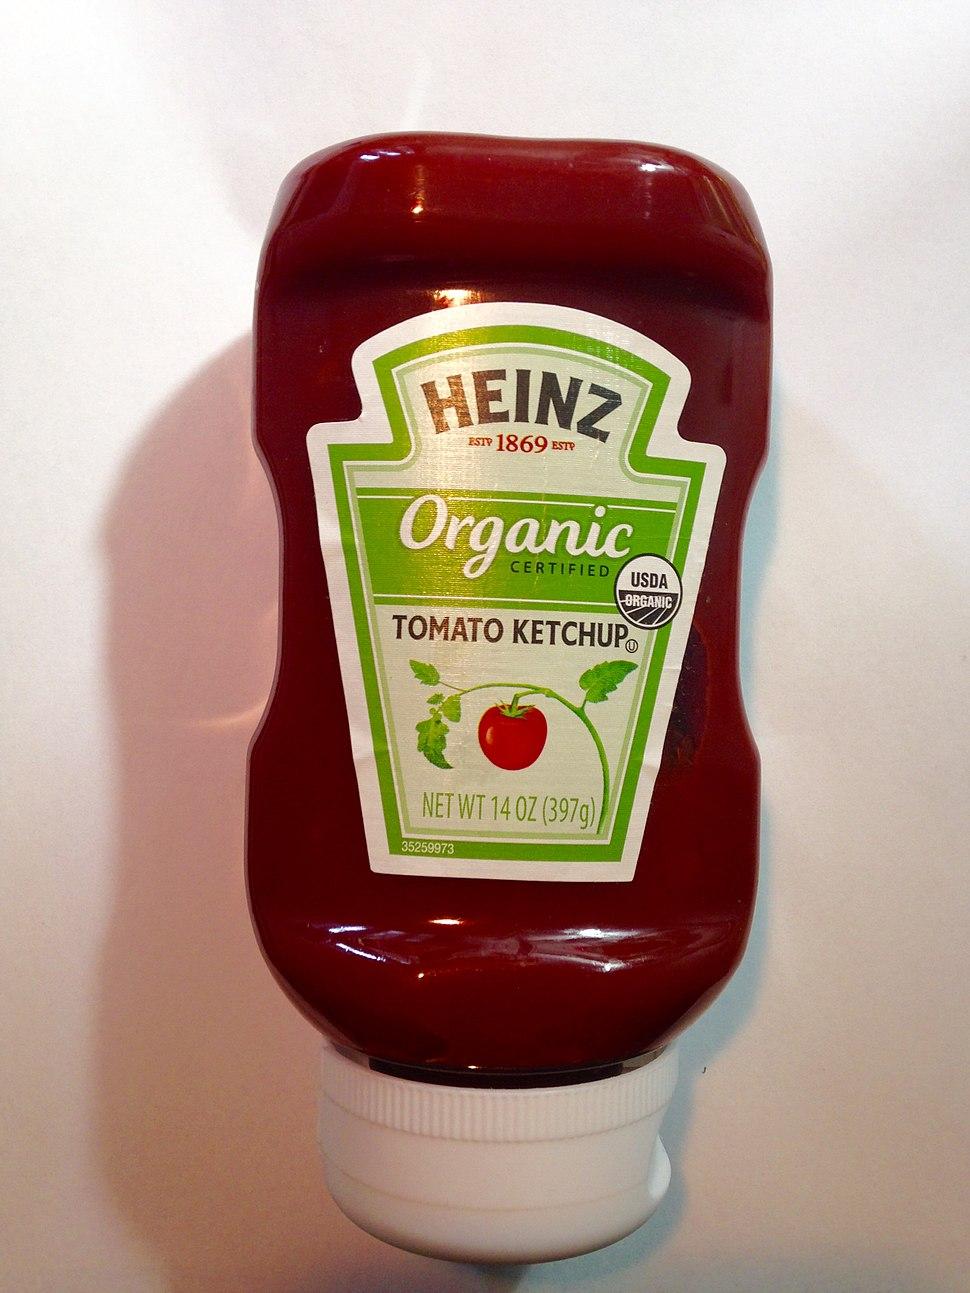 Heinz USDA Organic Tomato Ketchup